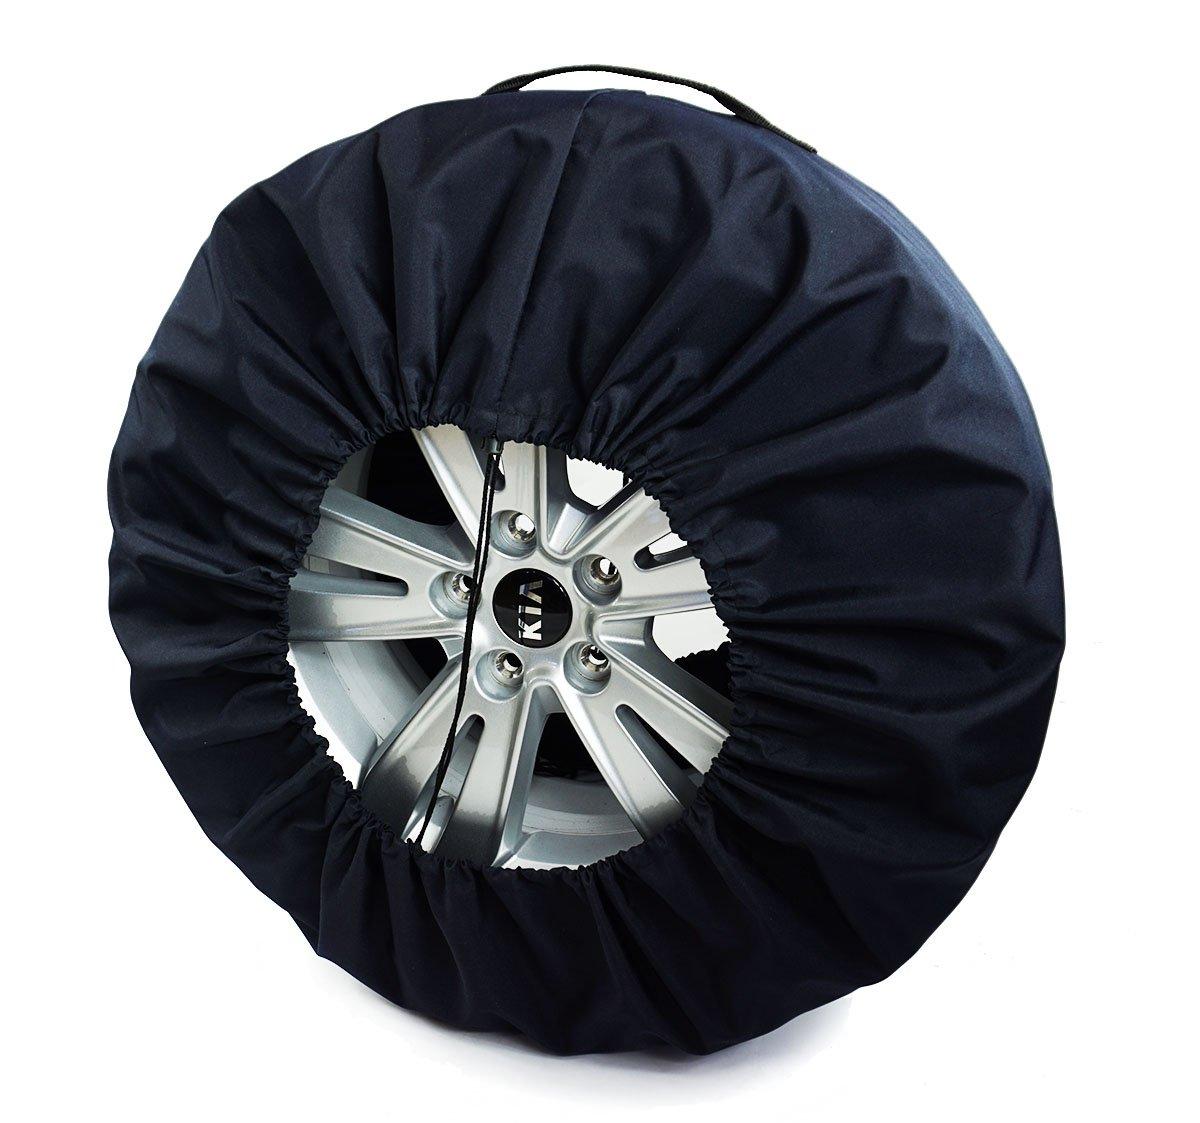 Ferocity Premium Cover Wheel 15-18' XXL Tyre Bag Protector